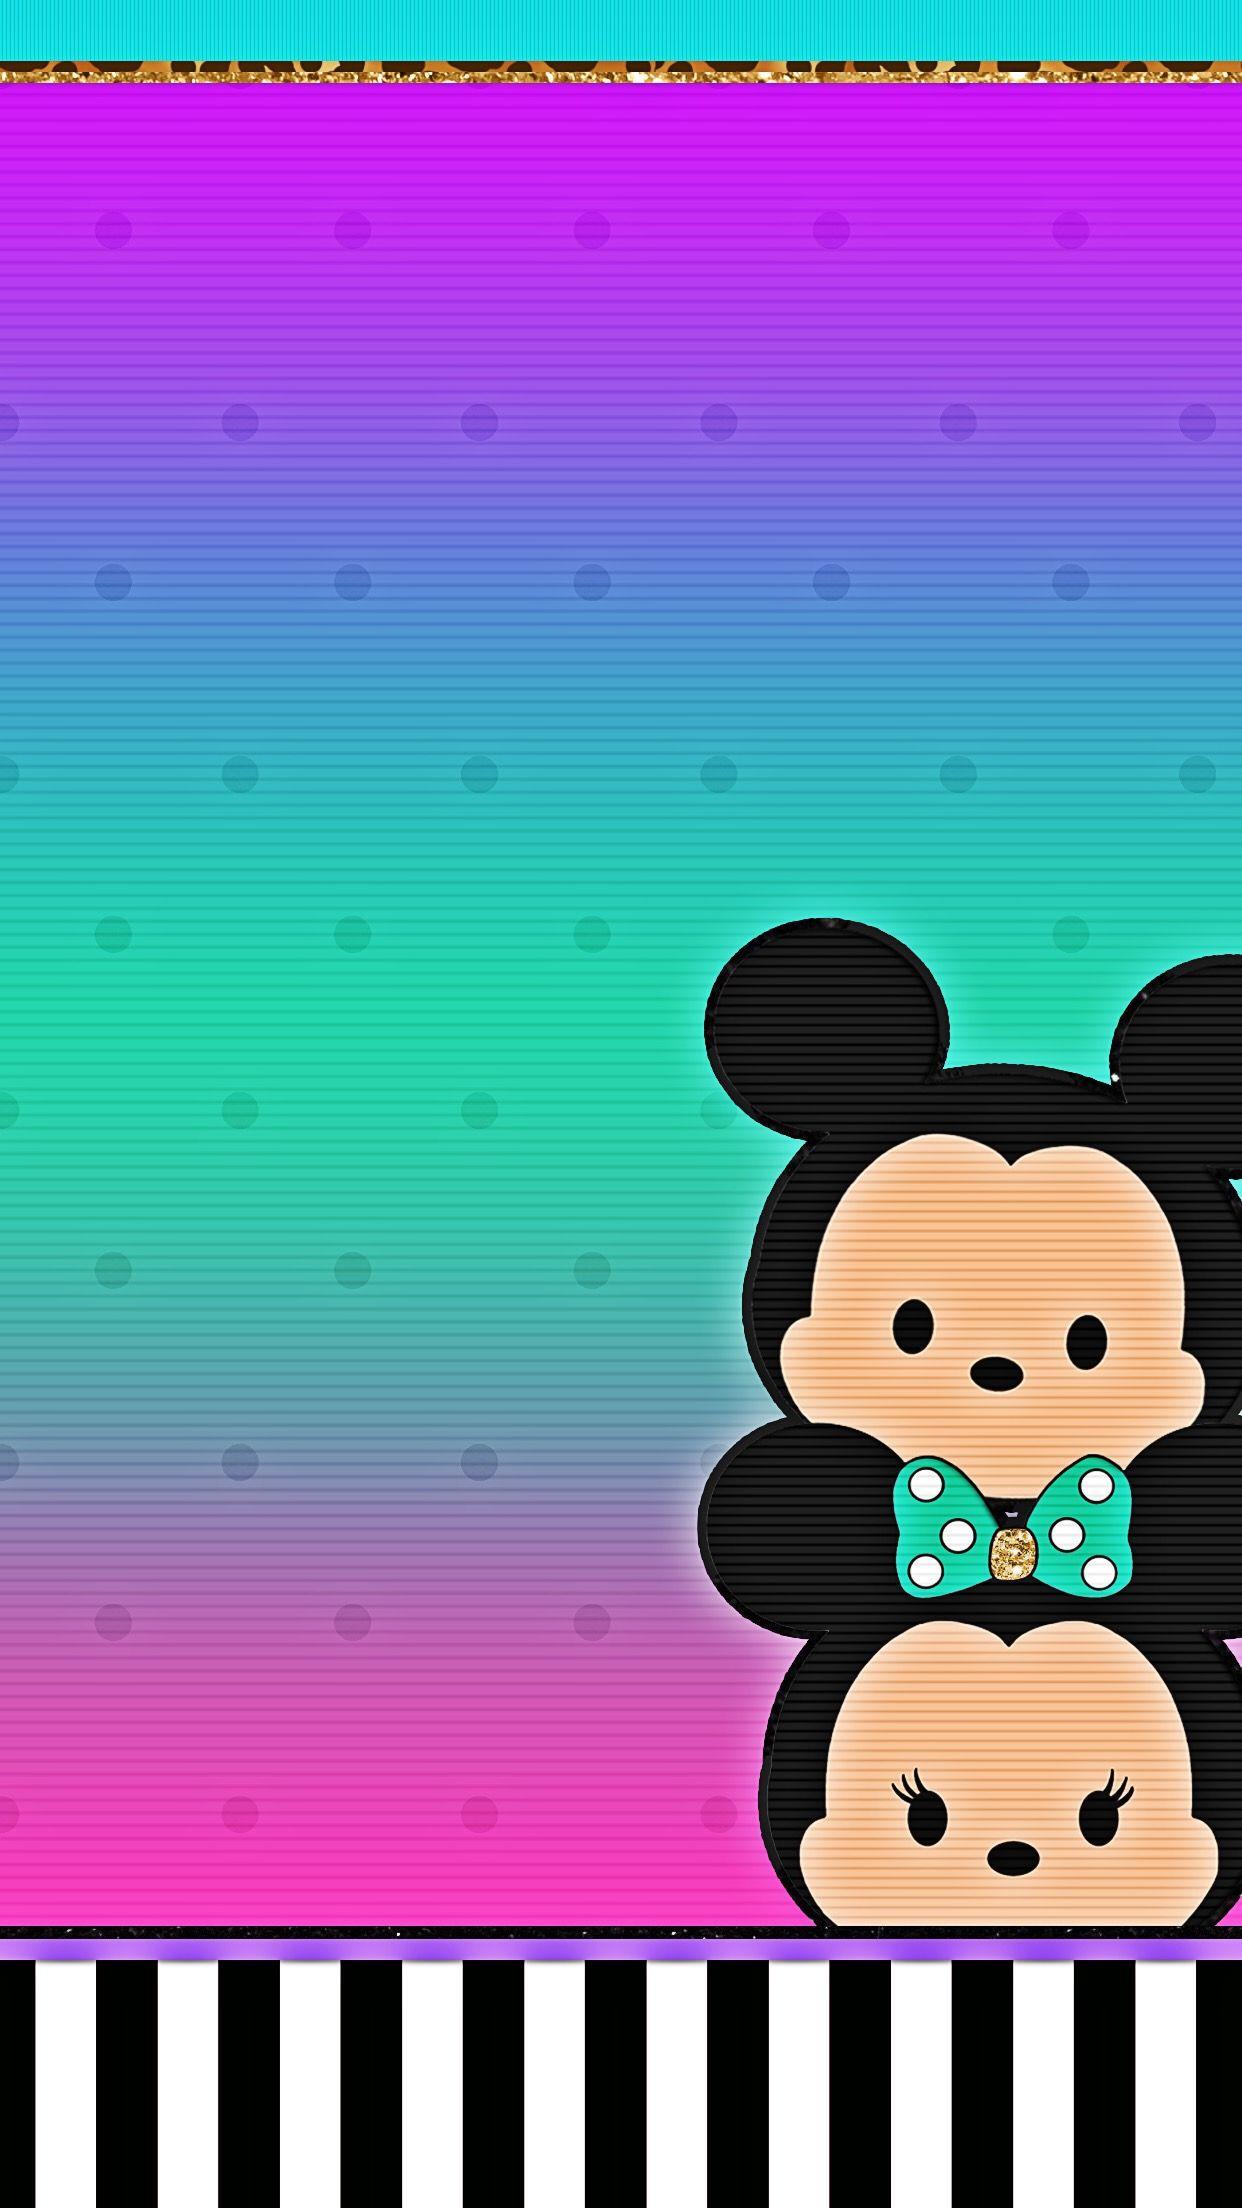 Iphone Wall Mm Tjn Mickey Mouse Wallpaper Cute Wallpaper